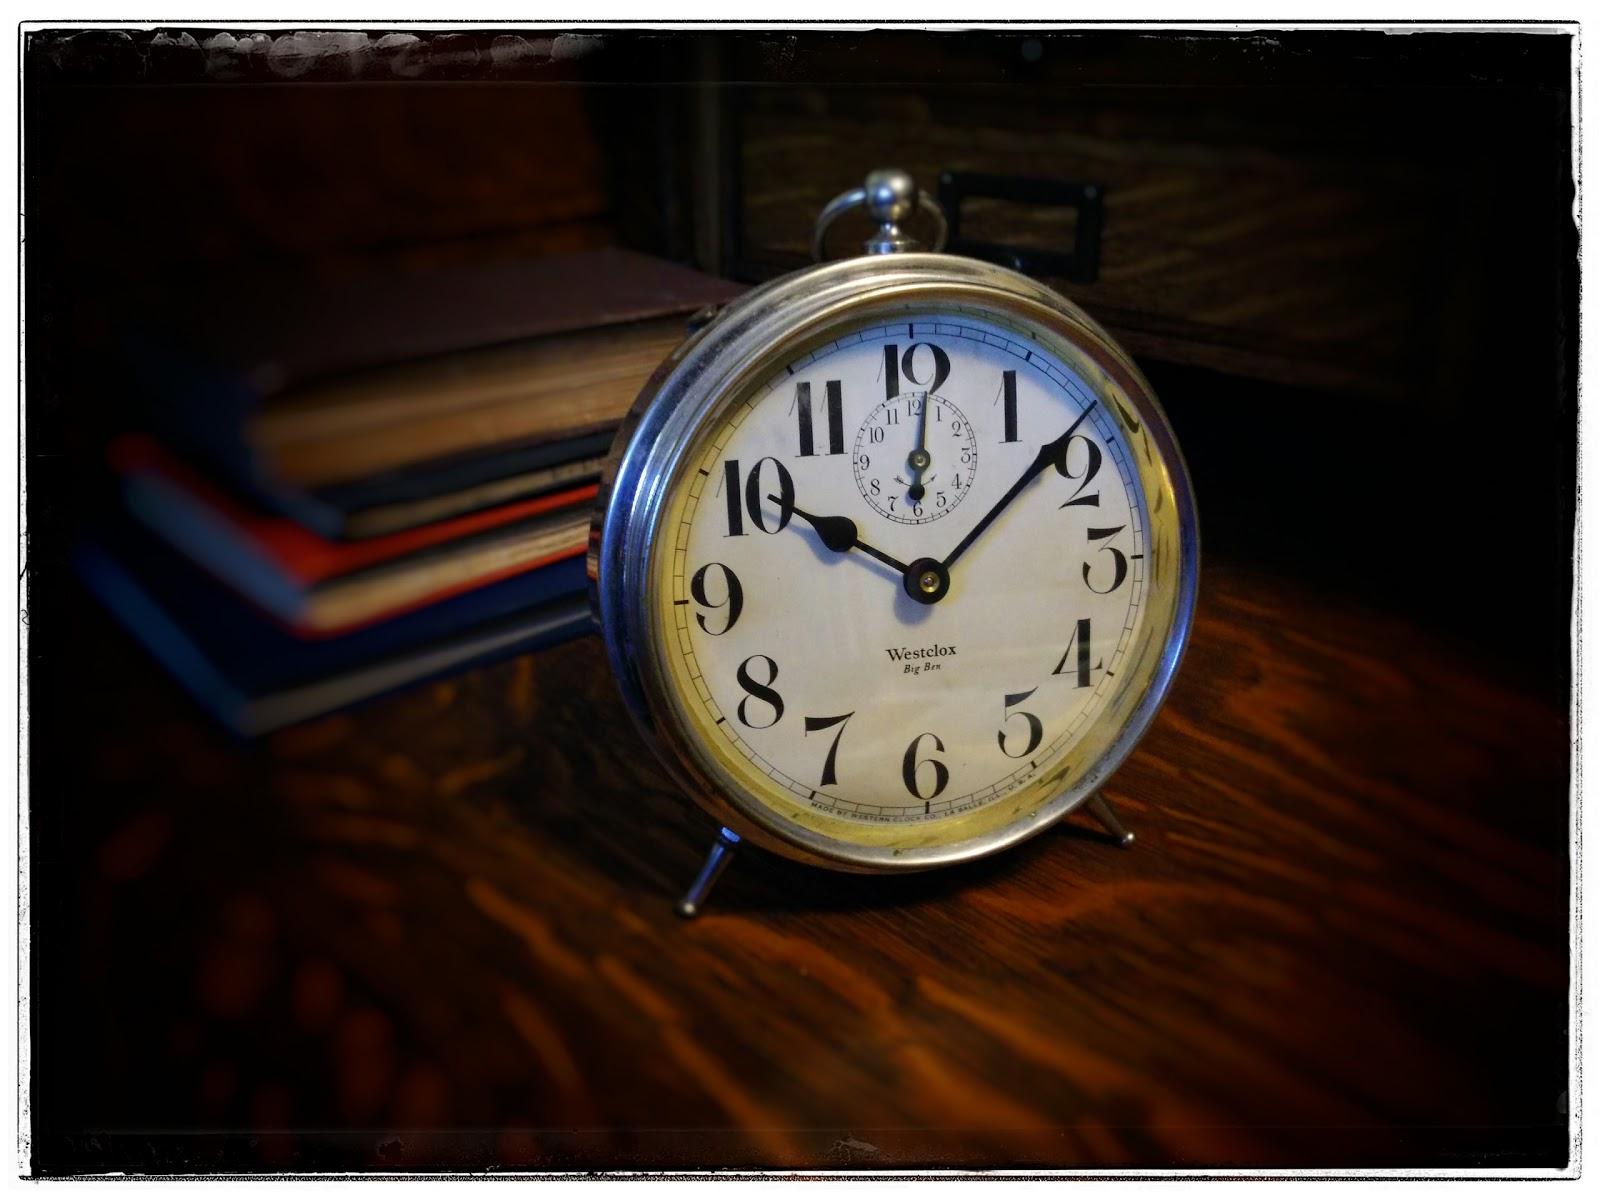 Westclox Big Ben Elgintime Vintage Horological